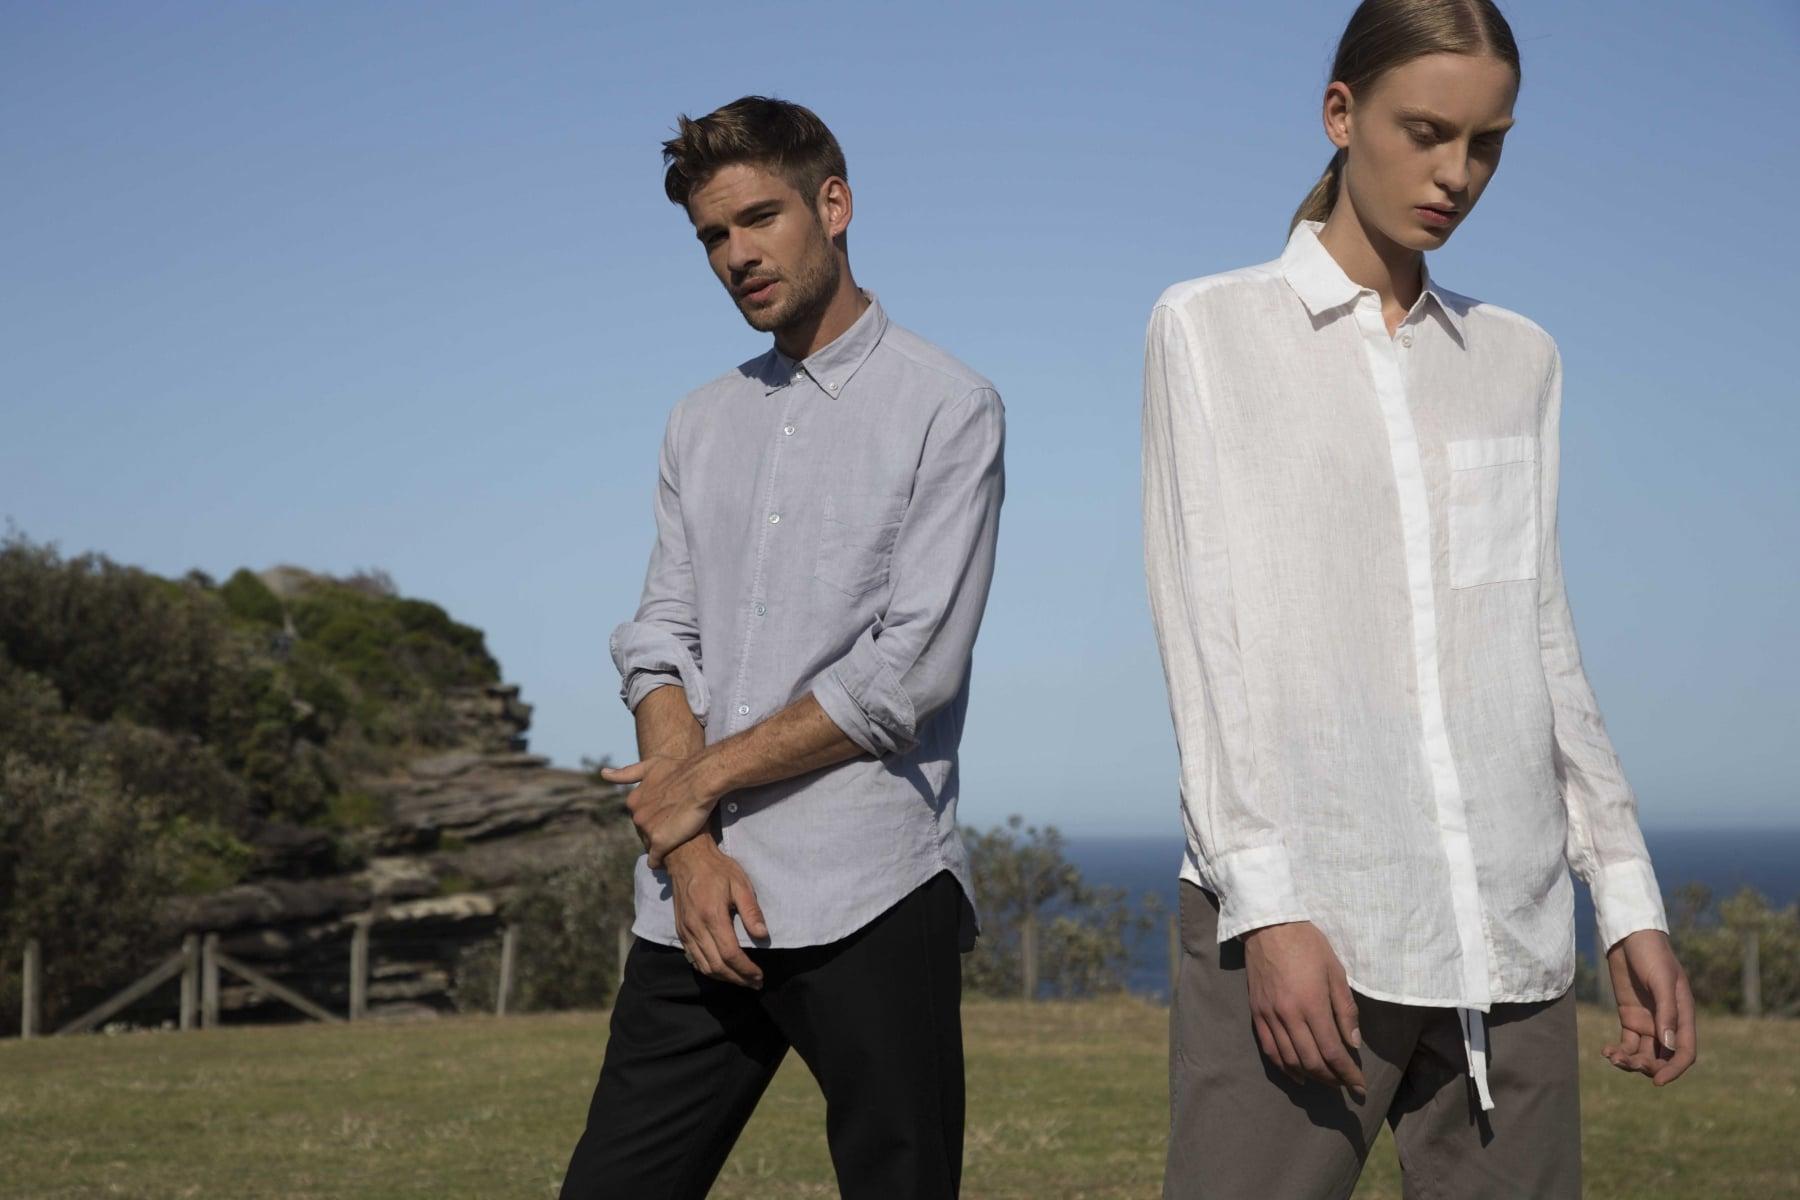 assembly label voucher men and women wearing shirt